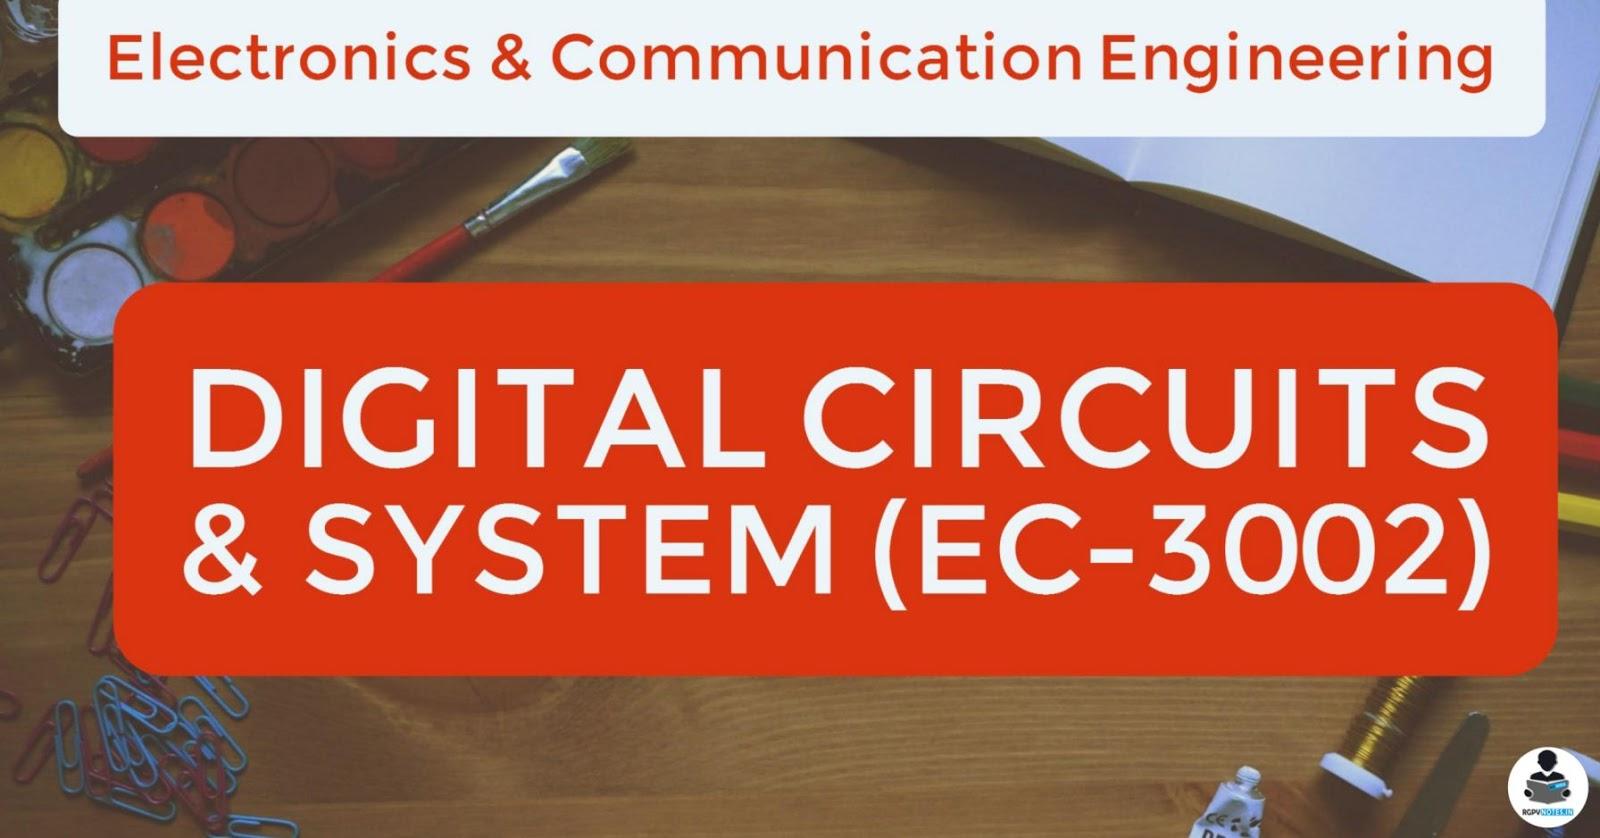 EC3002 - Digital circuits & system - RGPV notes CBGS